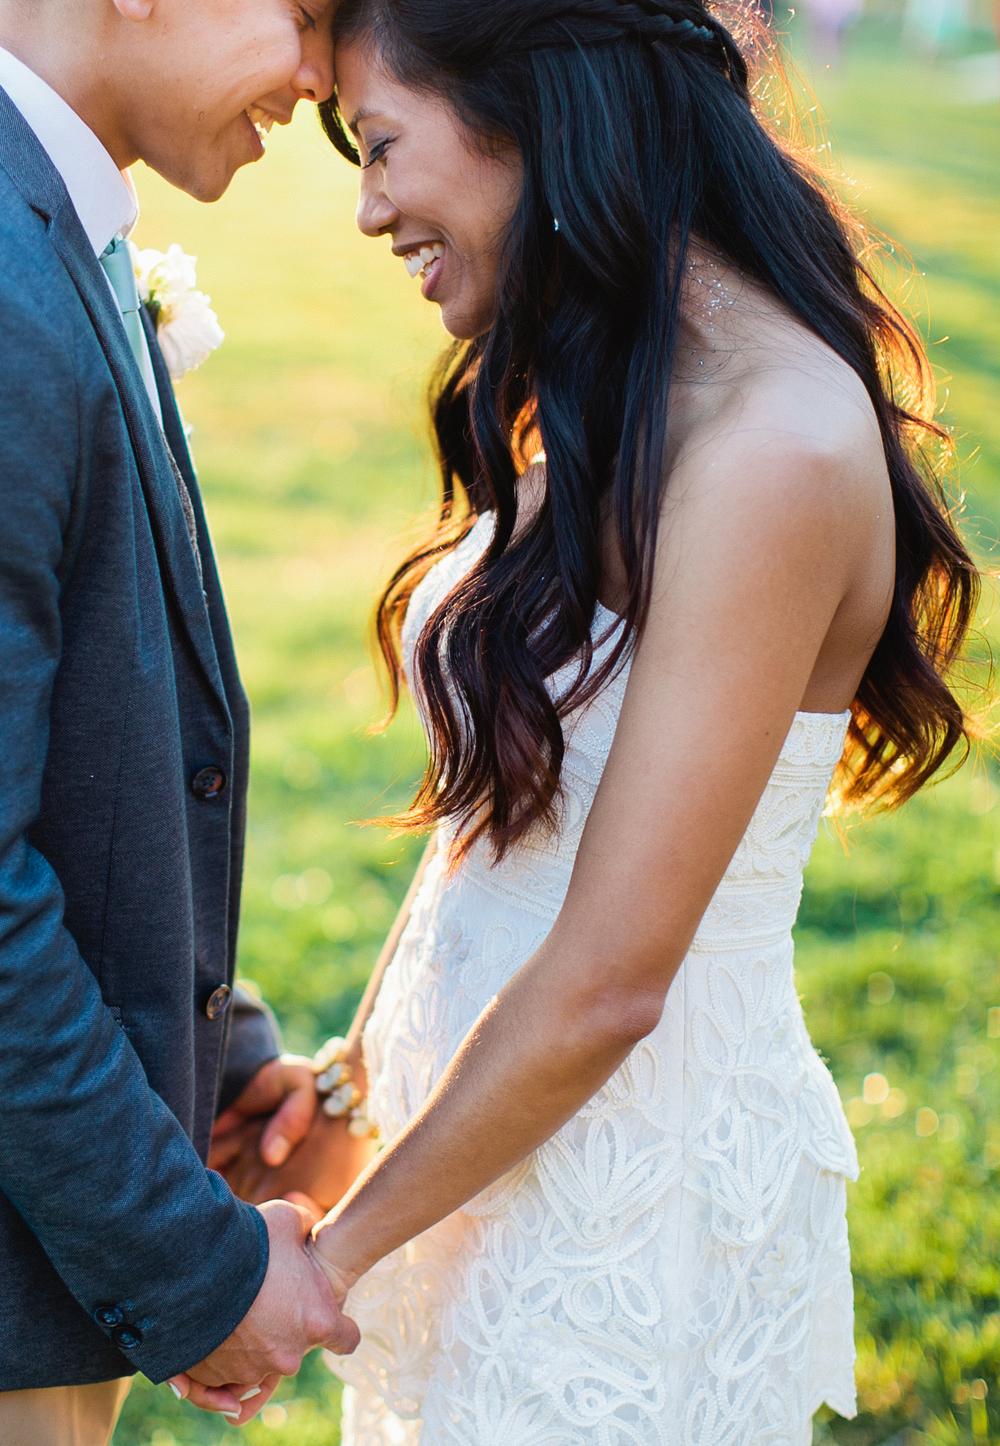 ica_images_tim_wedding_bay_im_kristen_DIY_maryland_photography216of218.jpg~original.jpeg